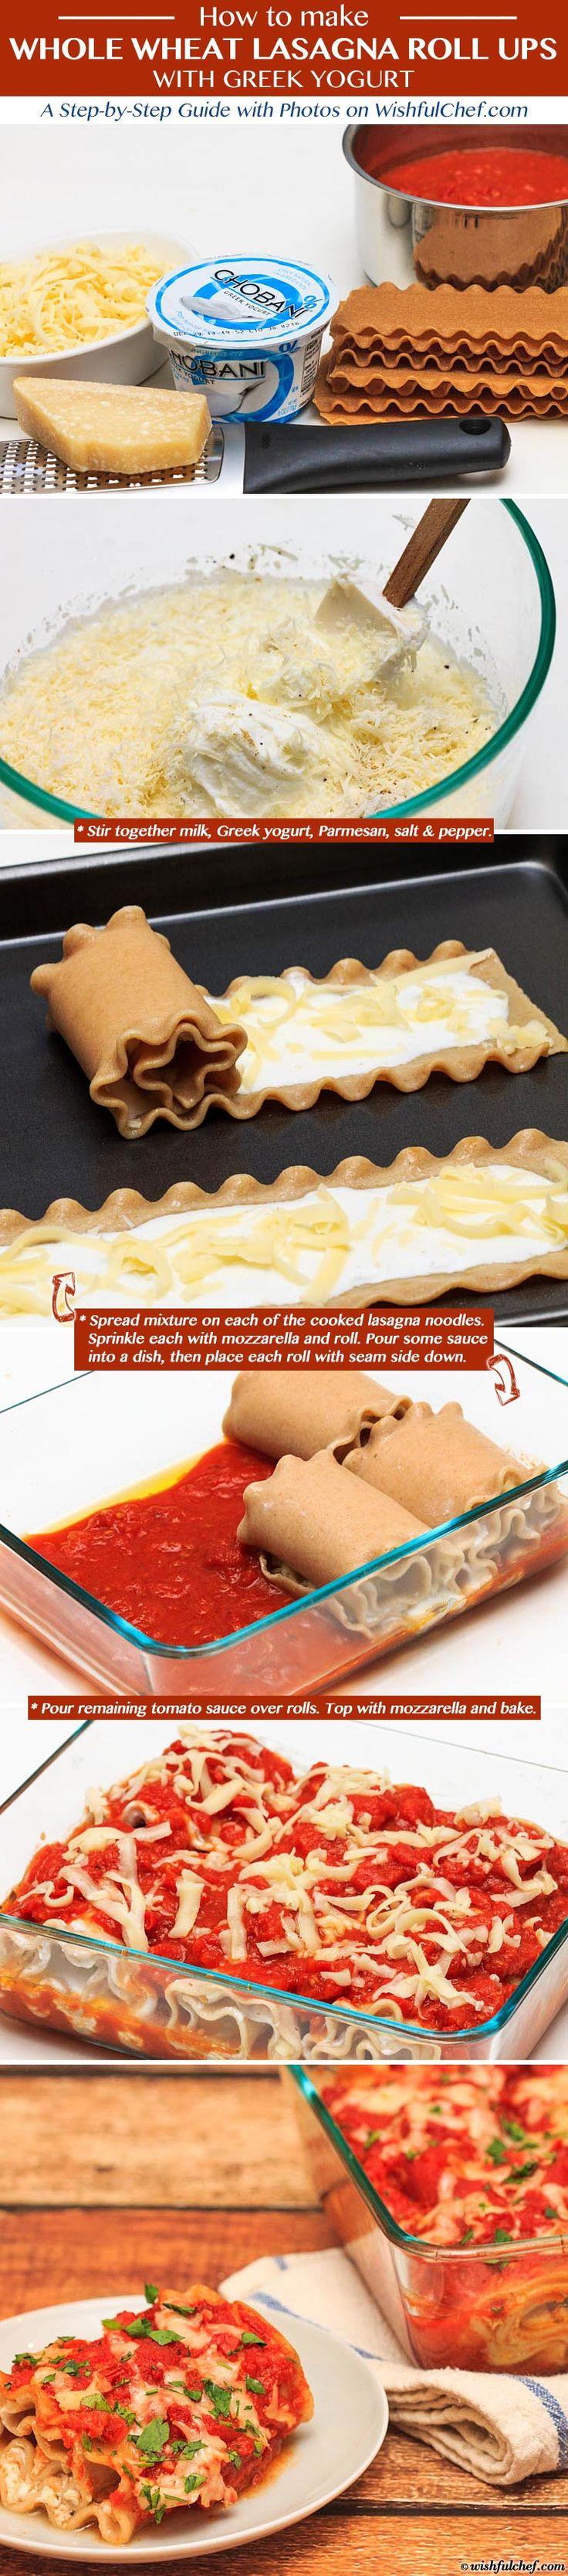 Whole Wheat Lasagna Roll Ups with Greek Yogurt // wishfulchef.com #step-by-step #lasagna